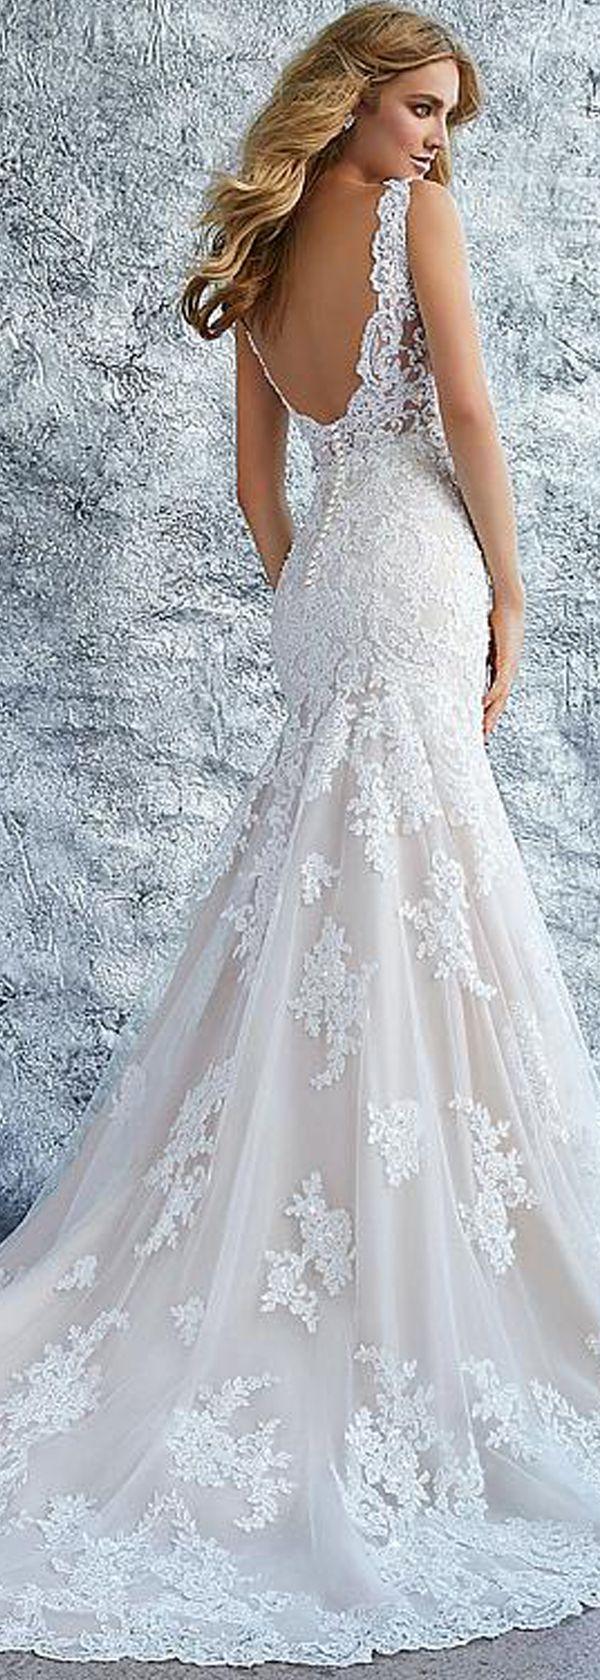 Contemporary Bohemian Chic Wedding Dress Adornment - All Wedding ...